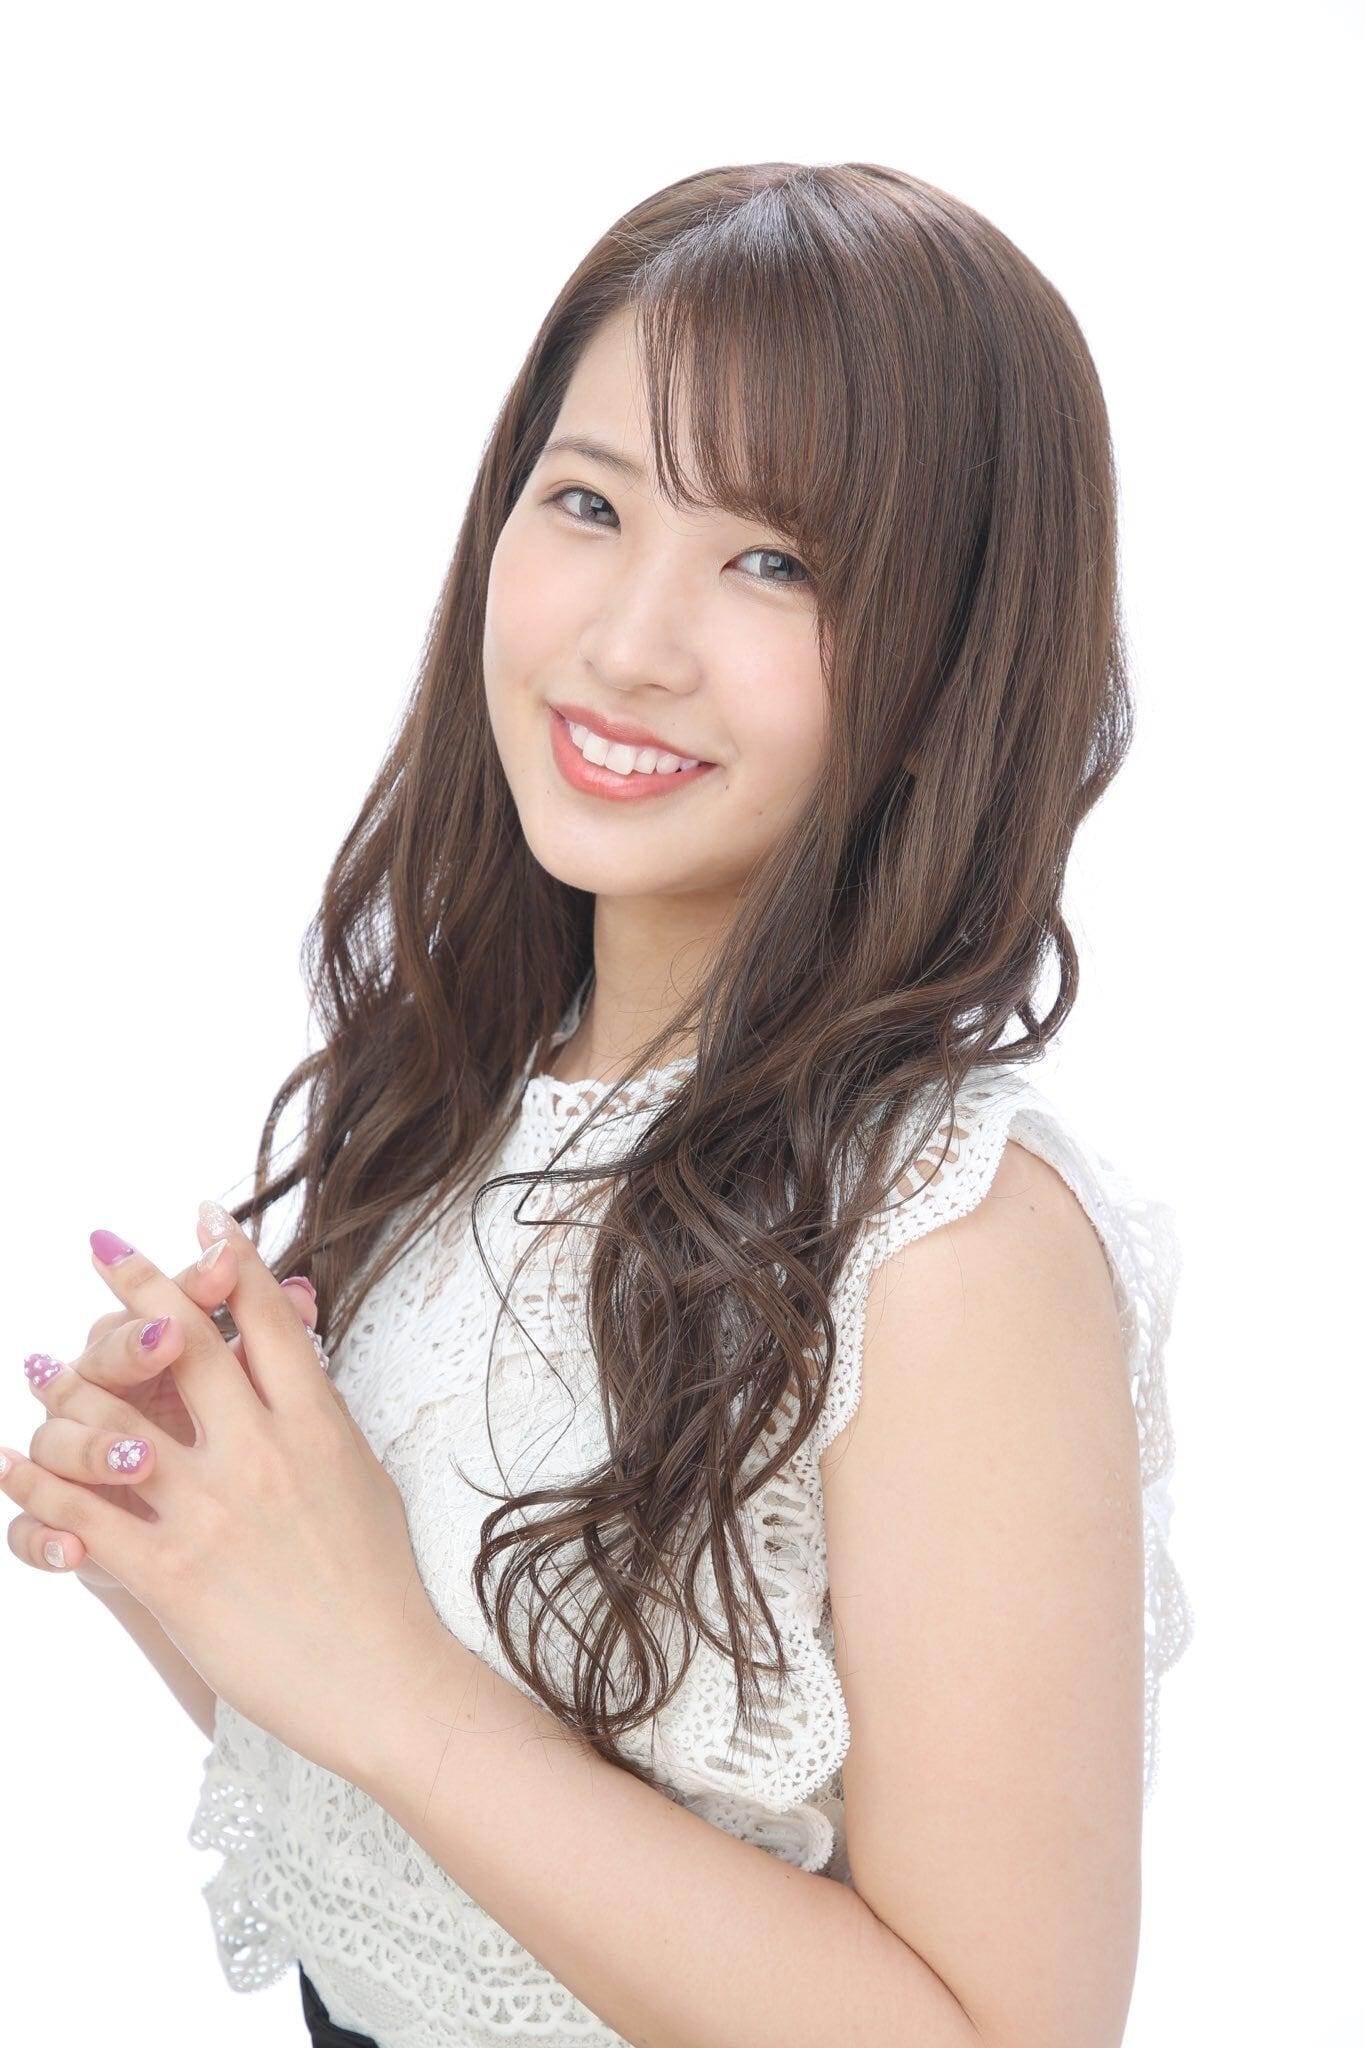 Kotone Watanabe